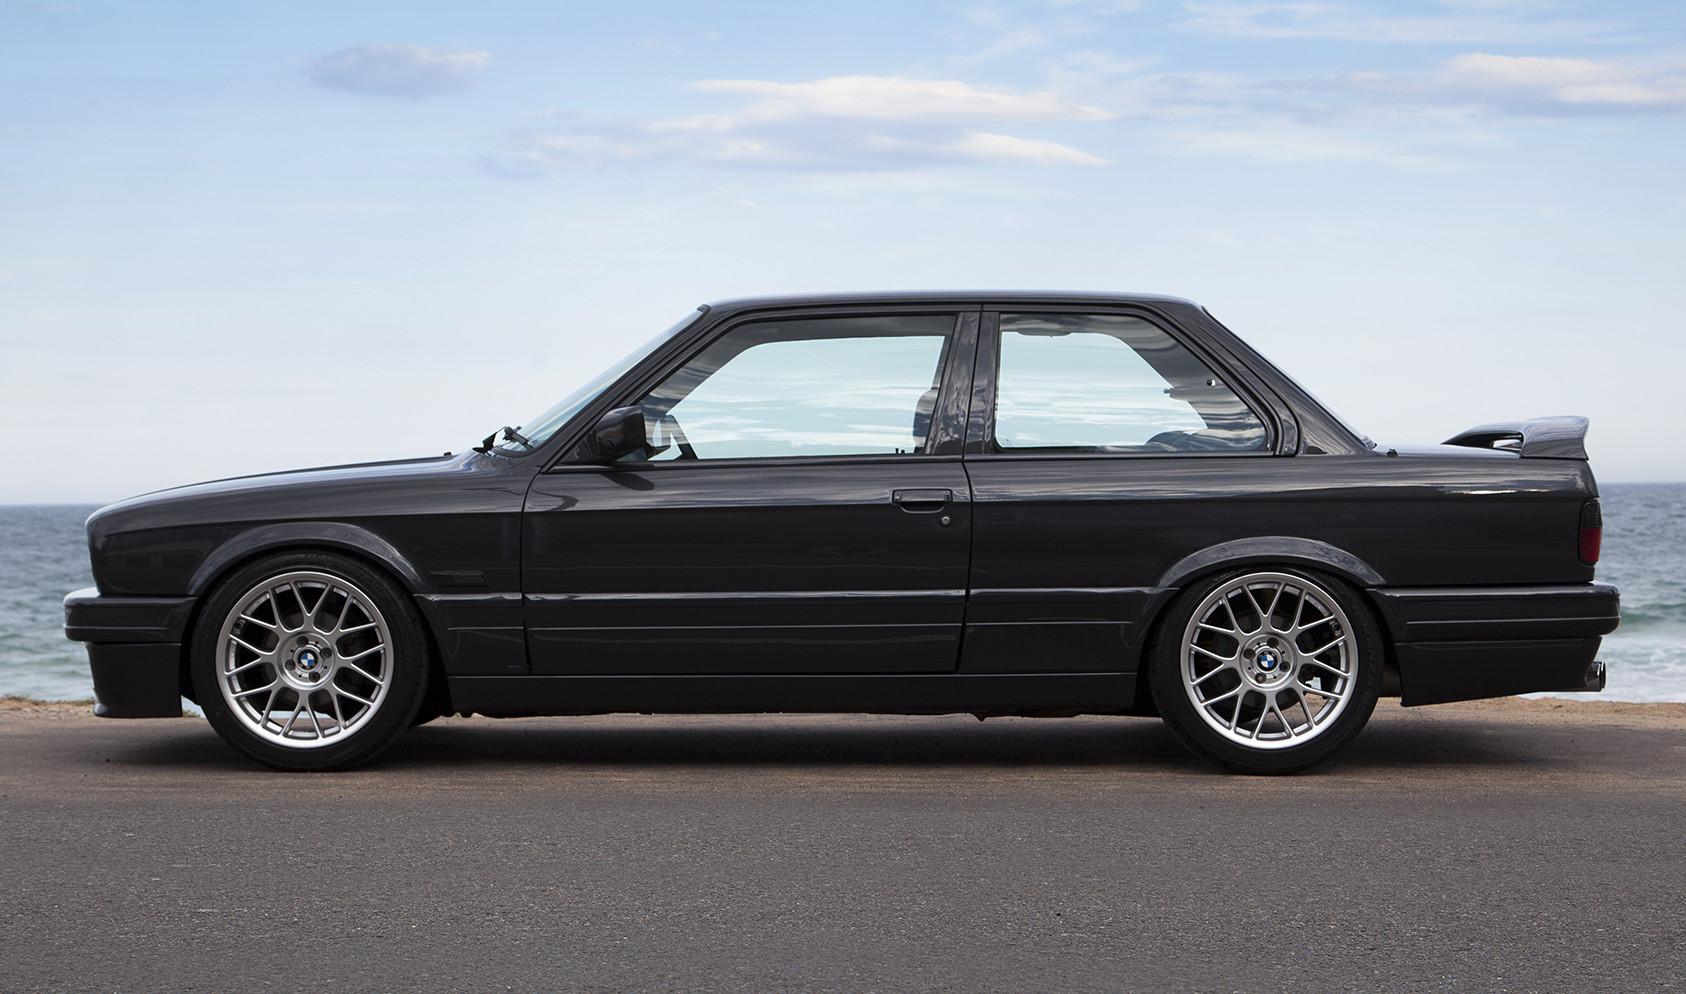 "E30<br />Wheels: 17x8"" ET25 Hyper Silver ARC-8<br />Tires: 215/45-17 Bridgestone Potenza"